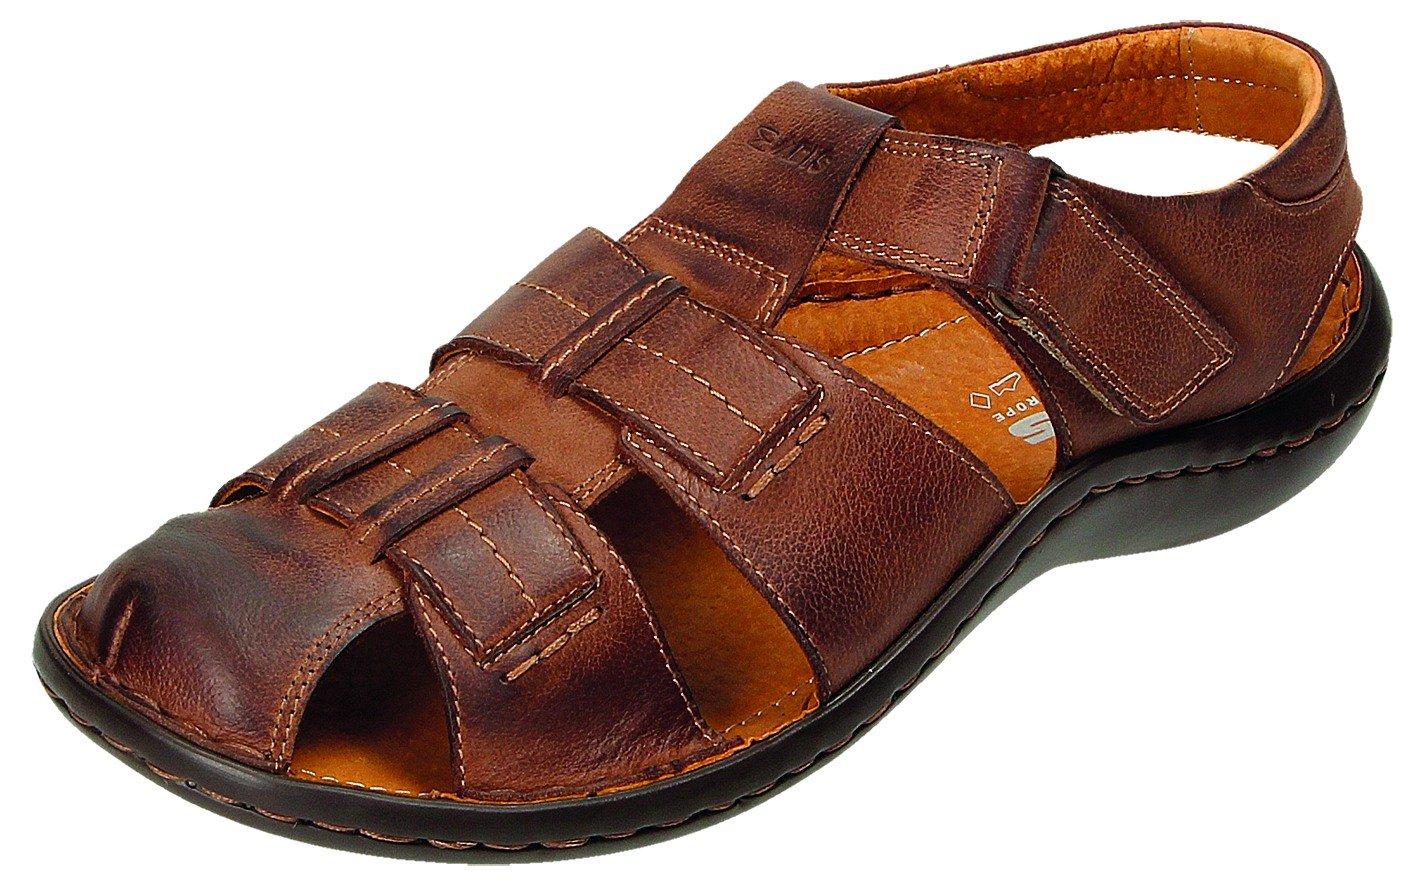 ABIS Sandalias de Vestir Para Hombre Marrón Marrón 43 EU|marrón